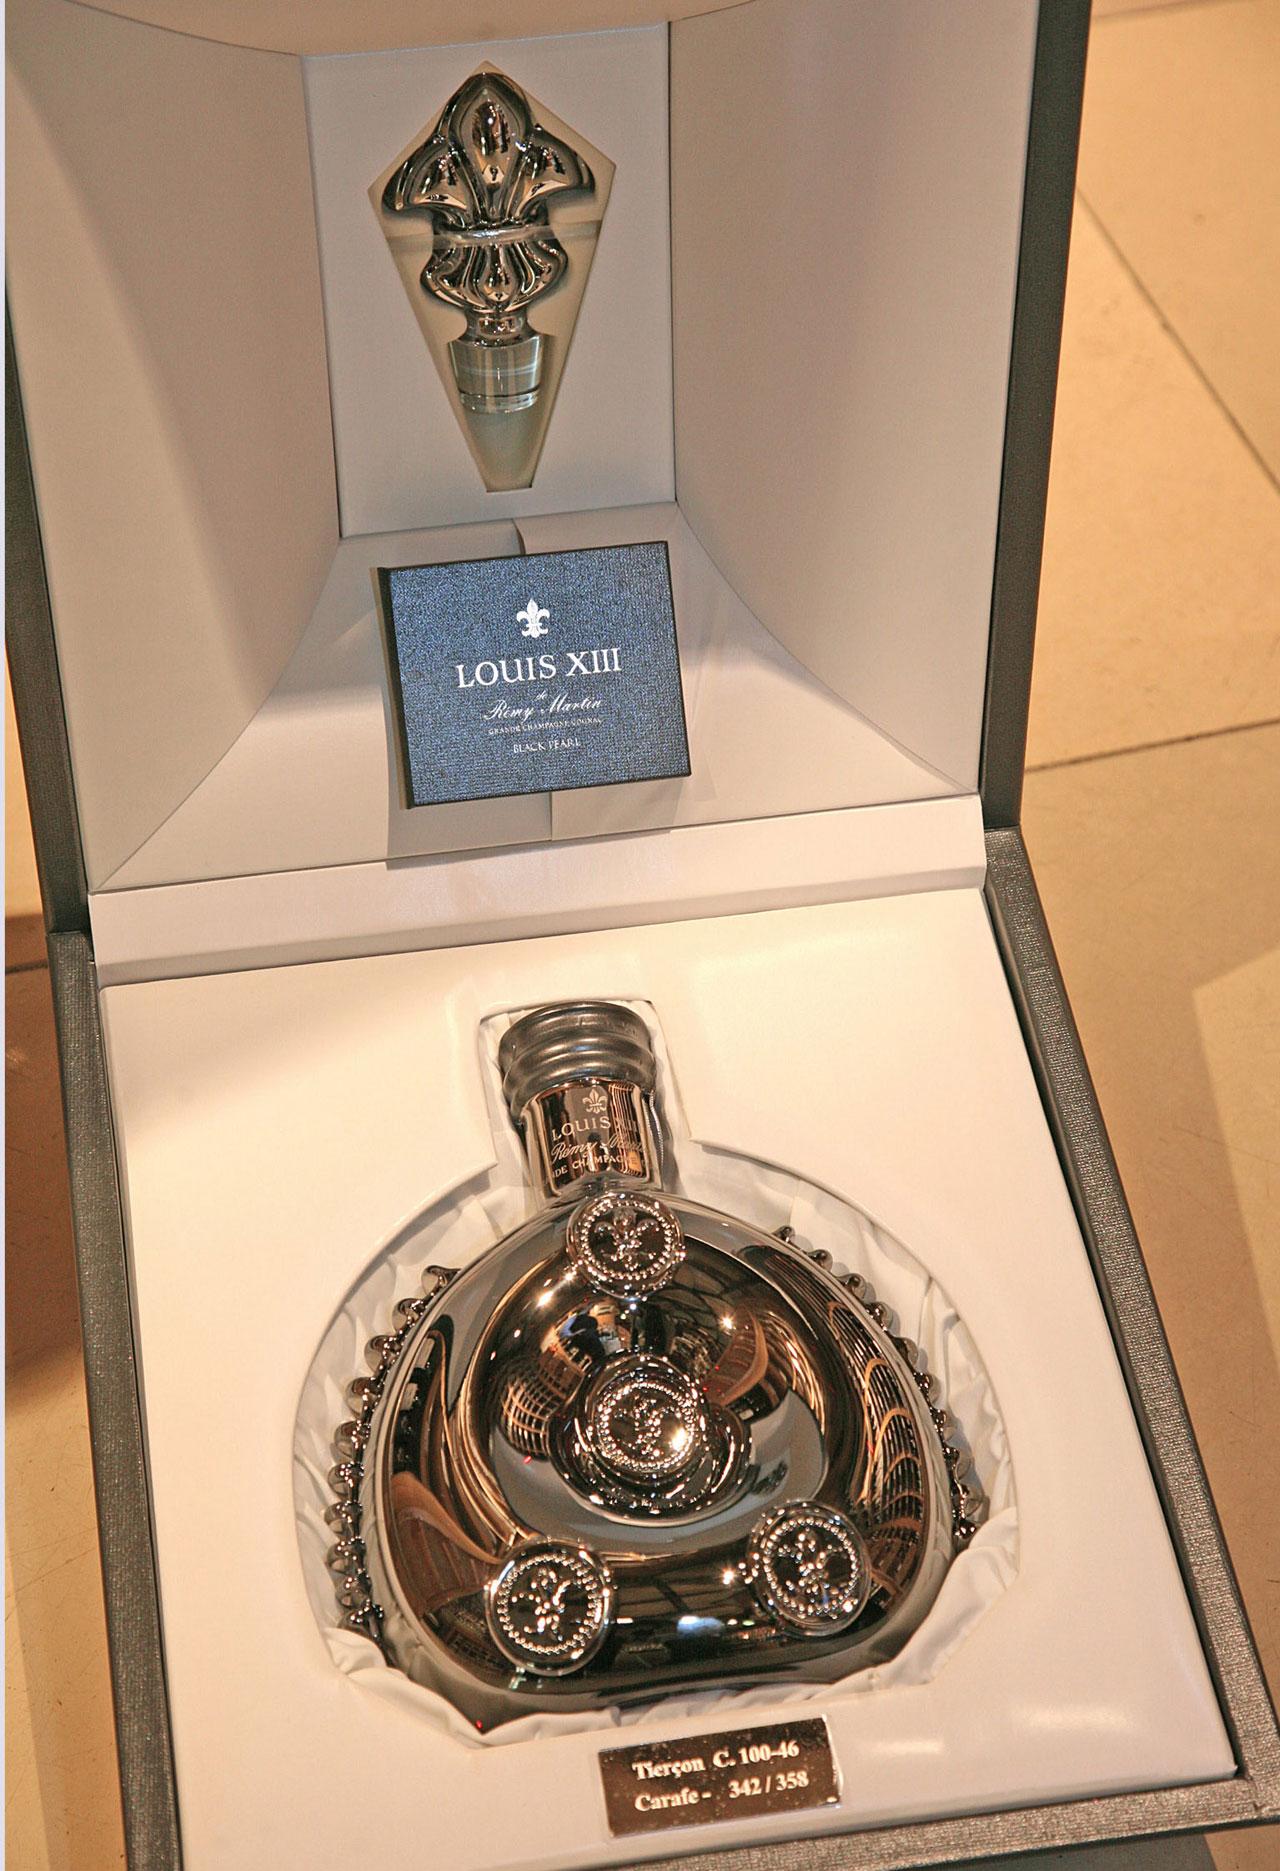 Rare Louis XIII Black Pearl Cognac